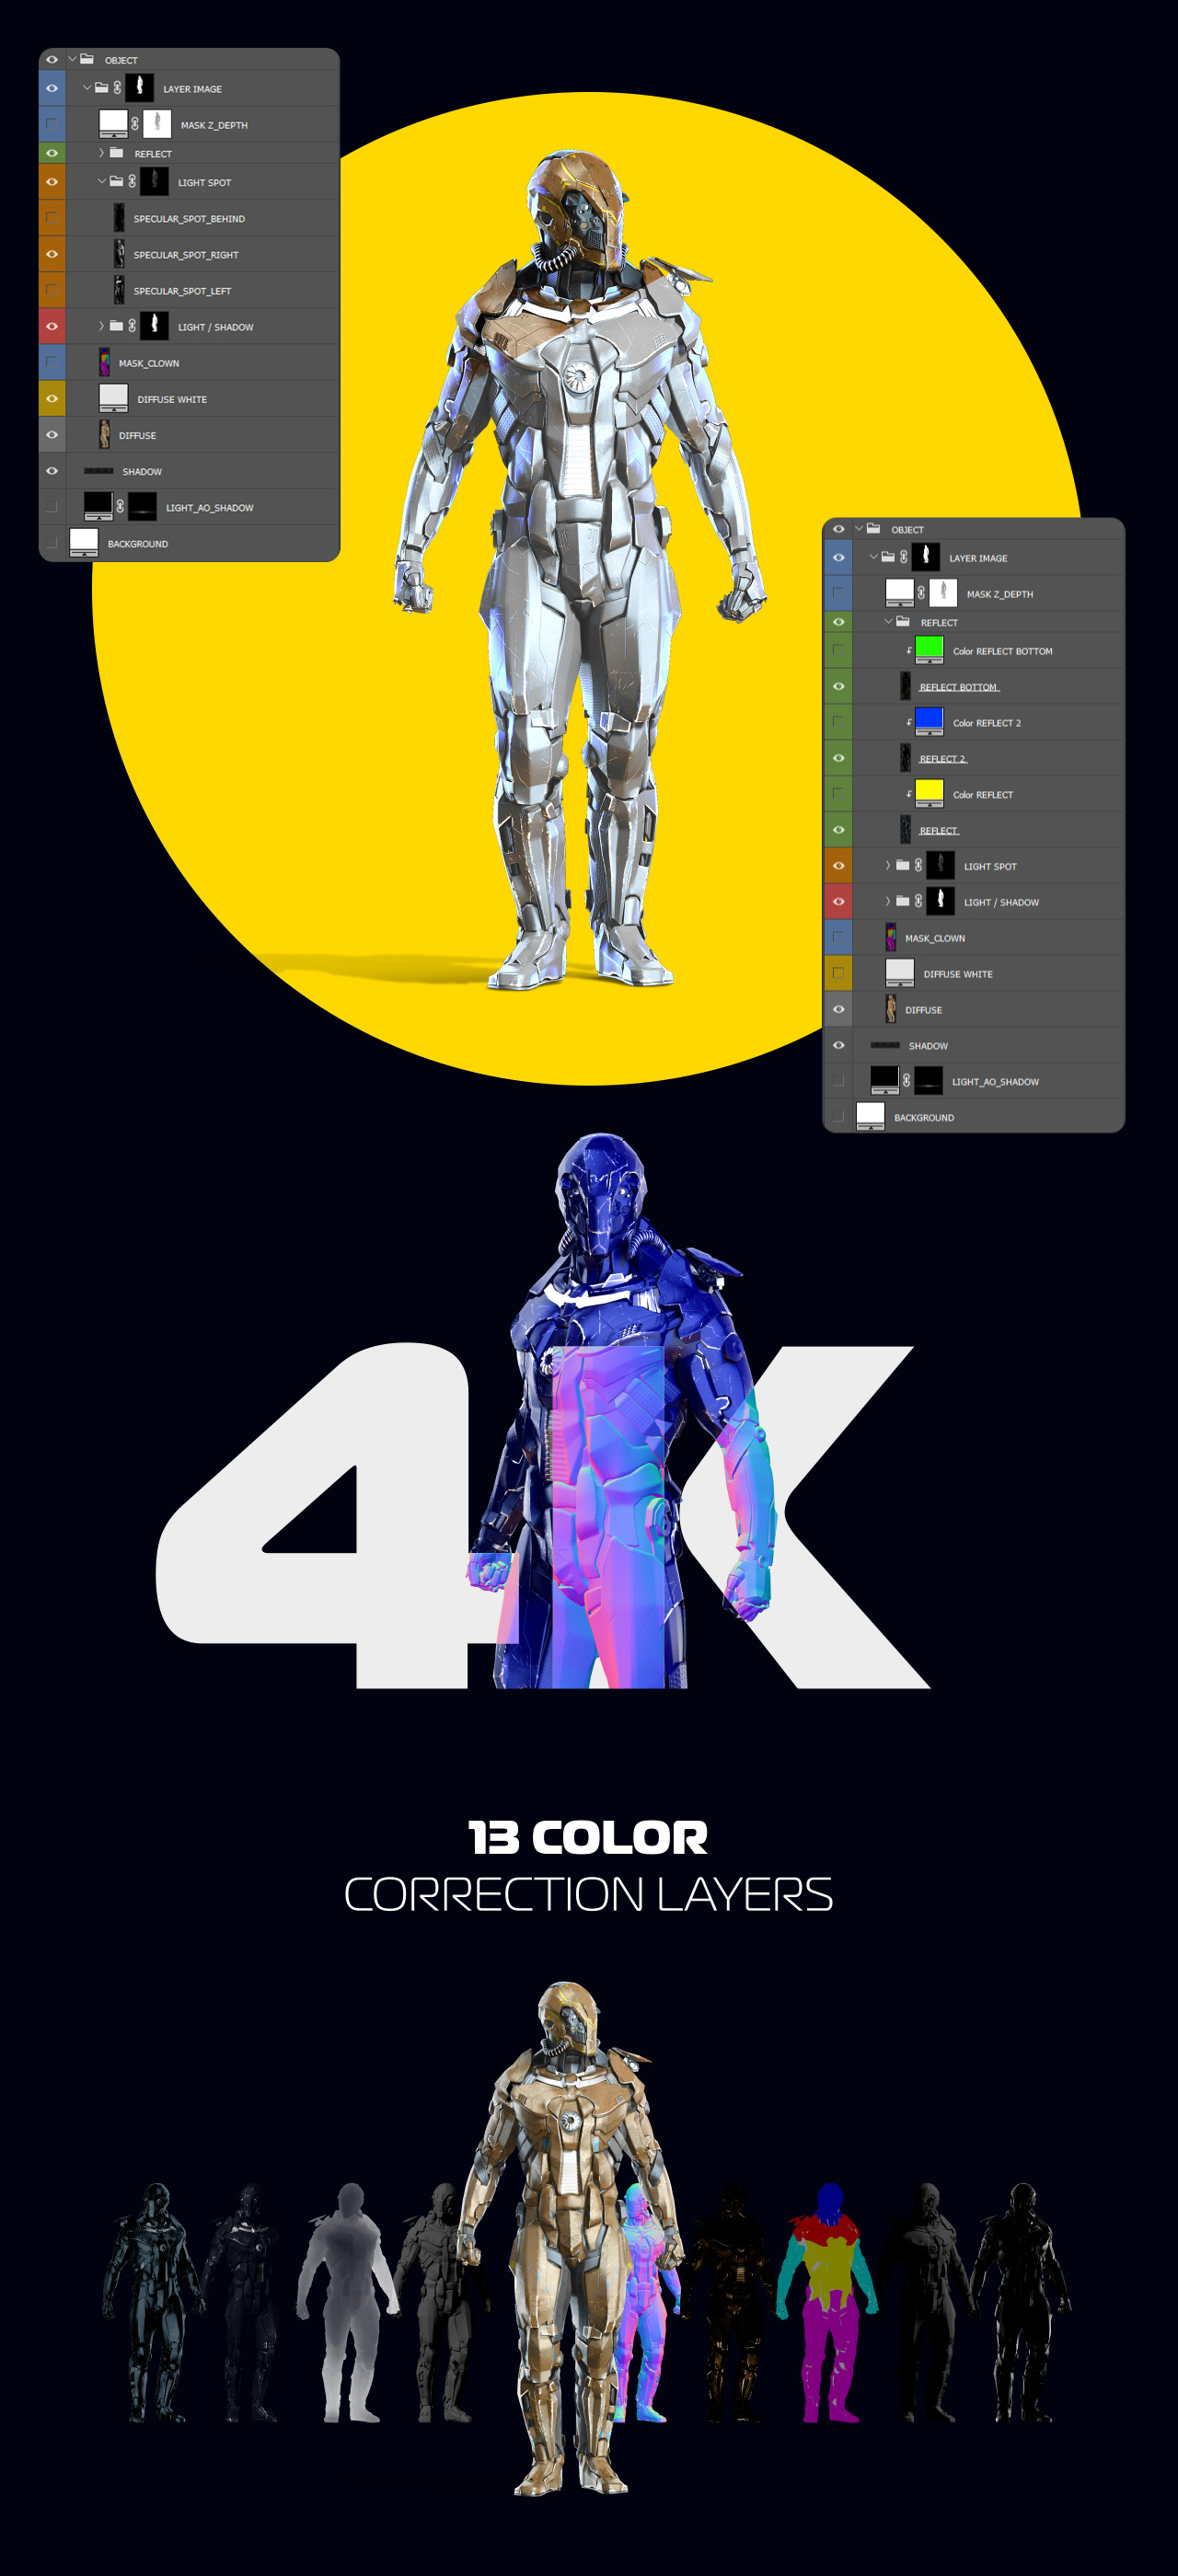 3D Mockup Space Astronaut Security Robots #16